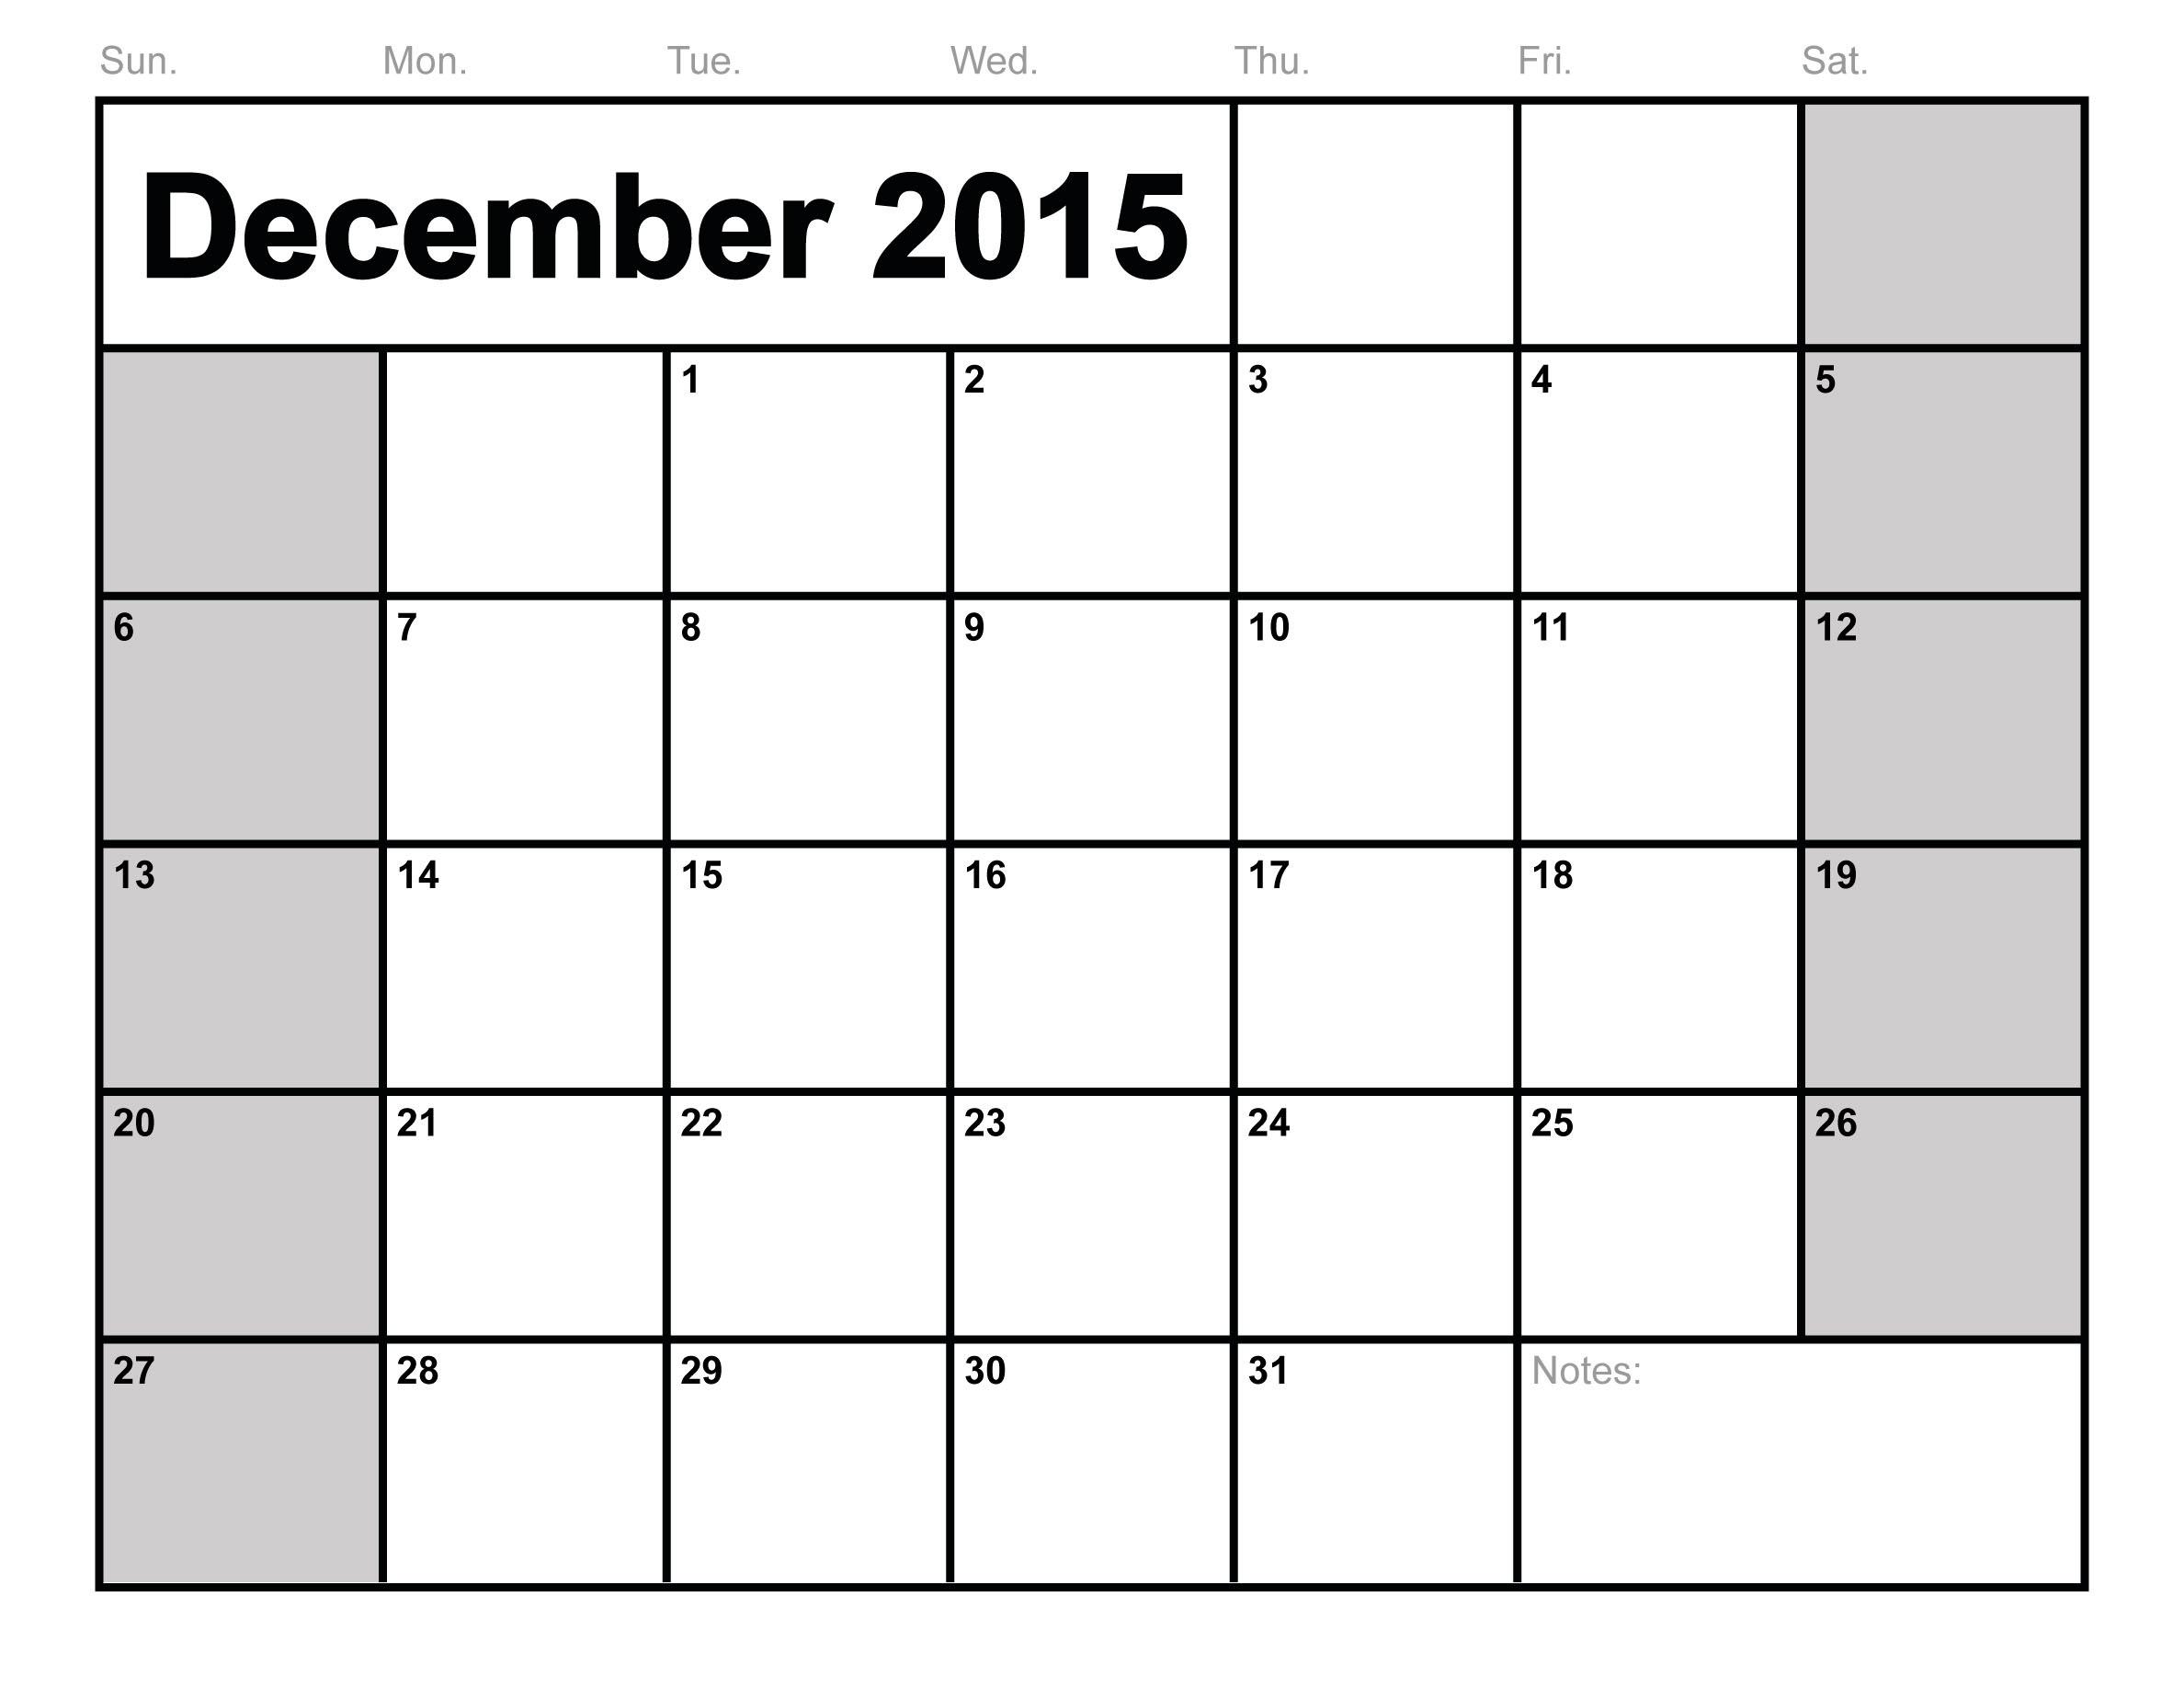 7 Images of 8 X 11 Printable Calendar 2015 Dec